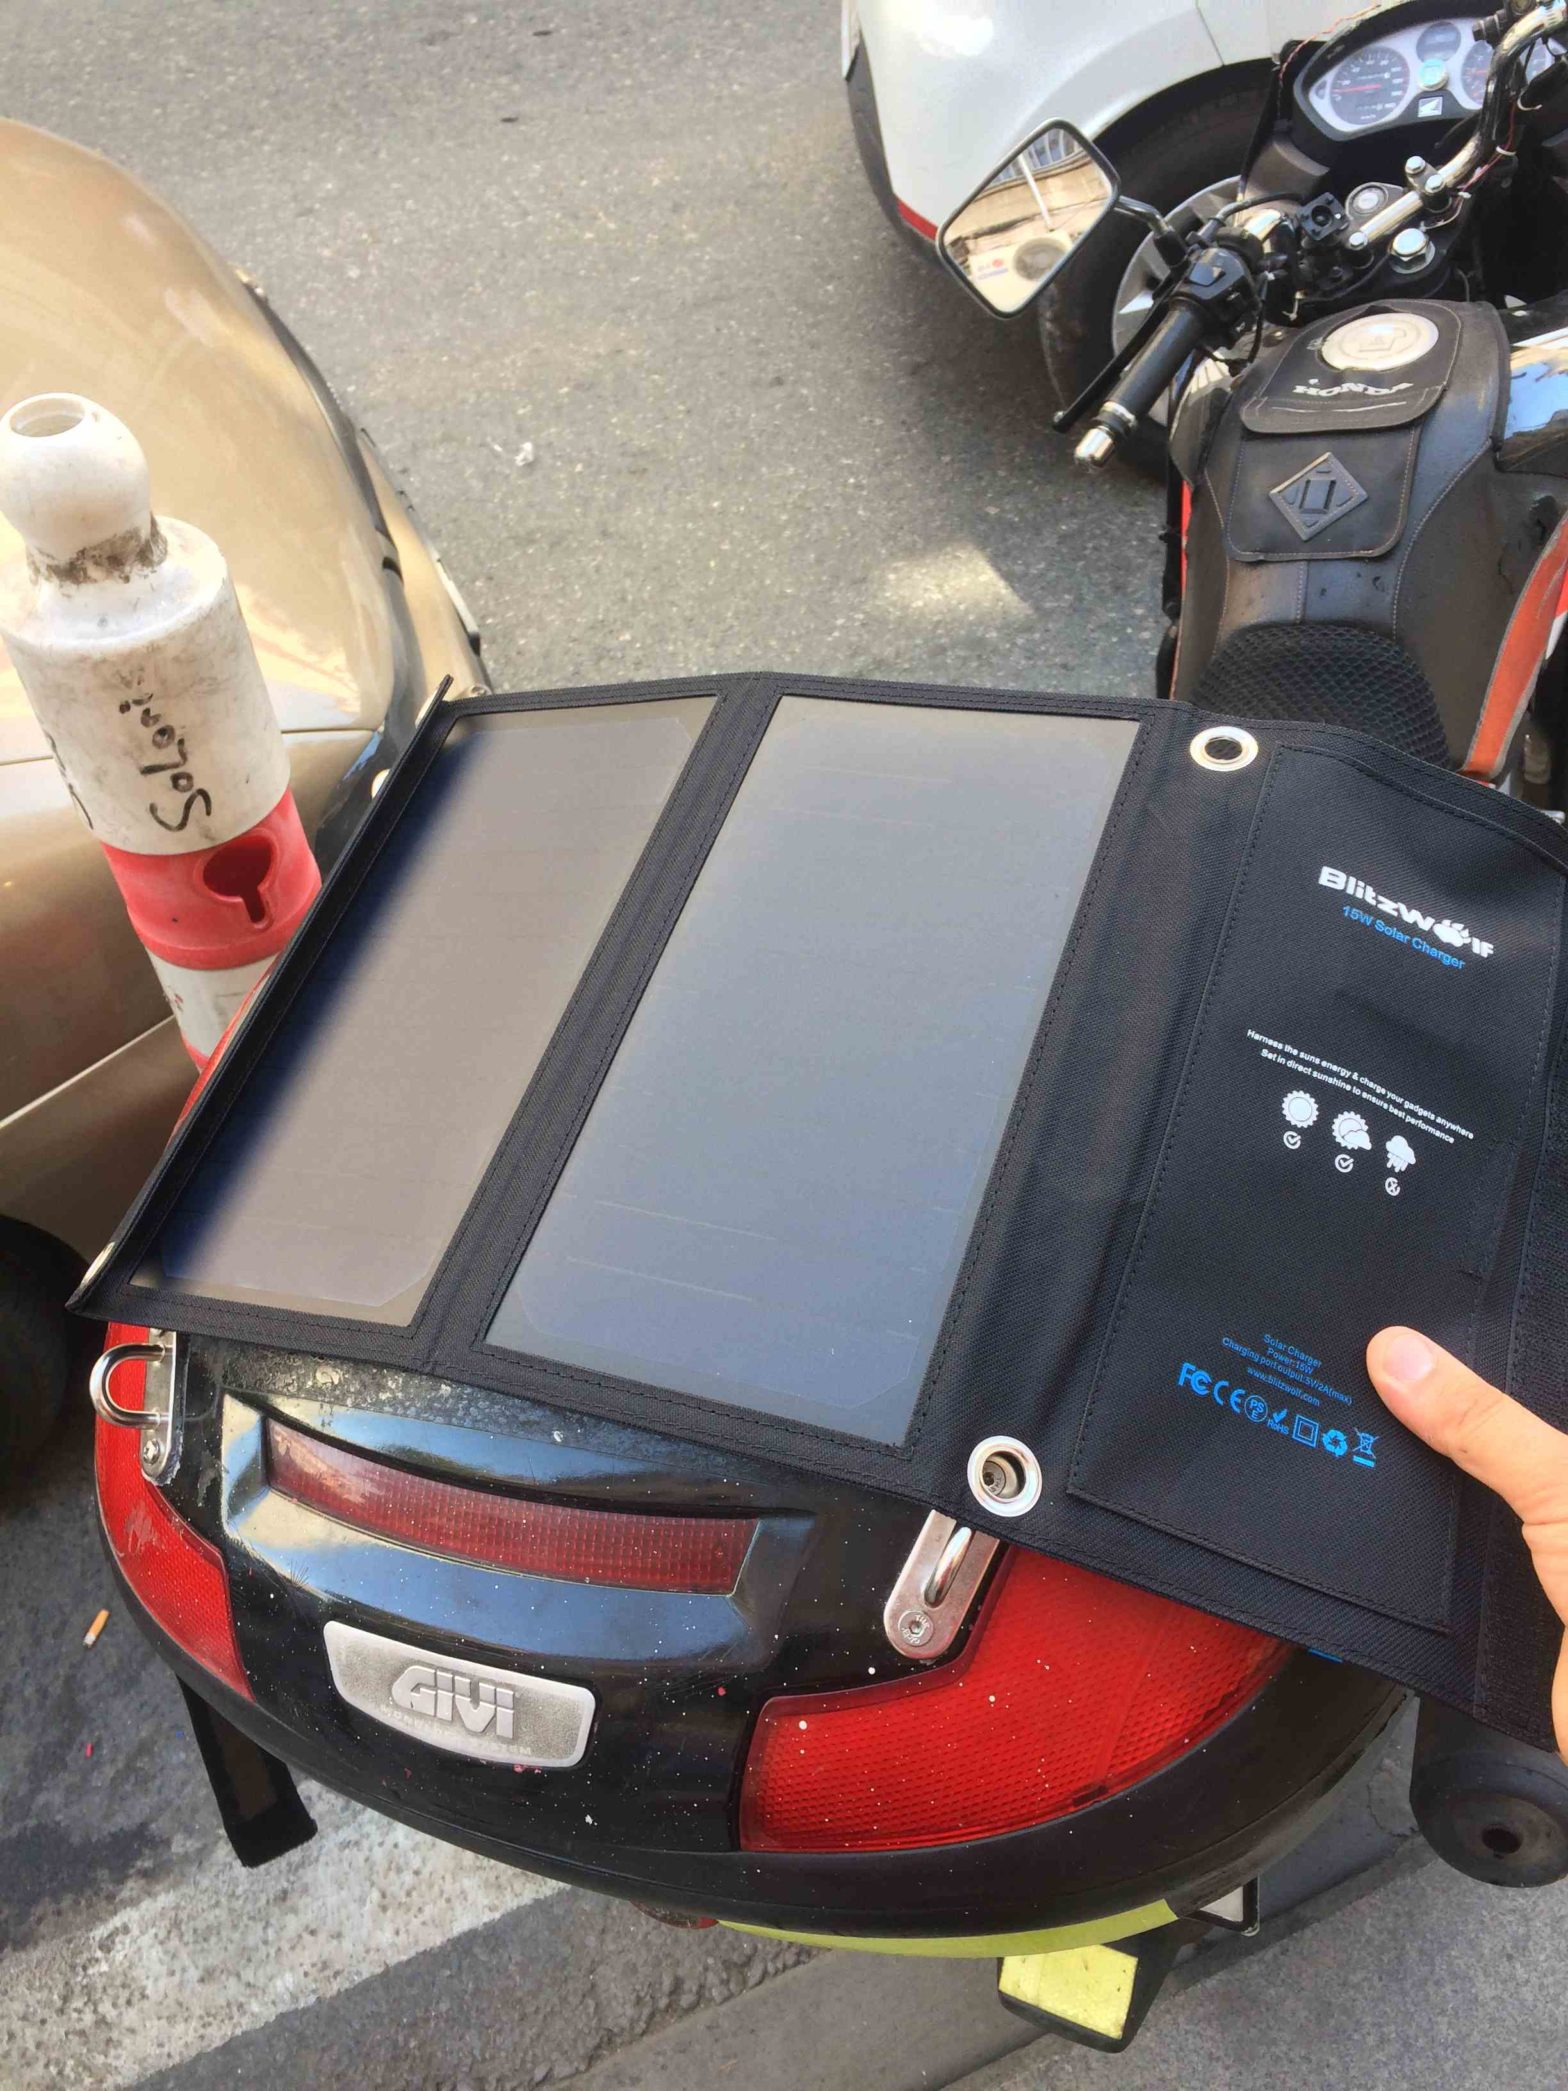 Blitz Wolf 15w Güneş enerjili telefon şarj cihazı